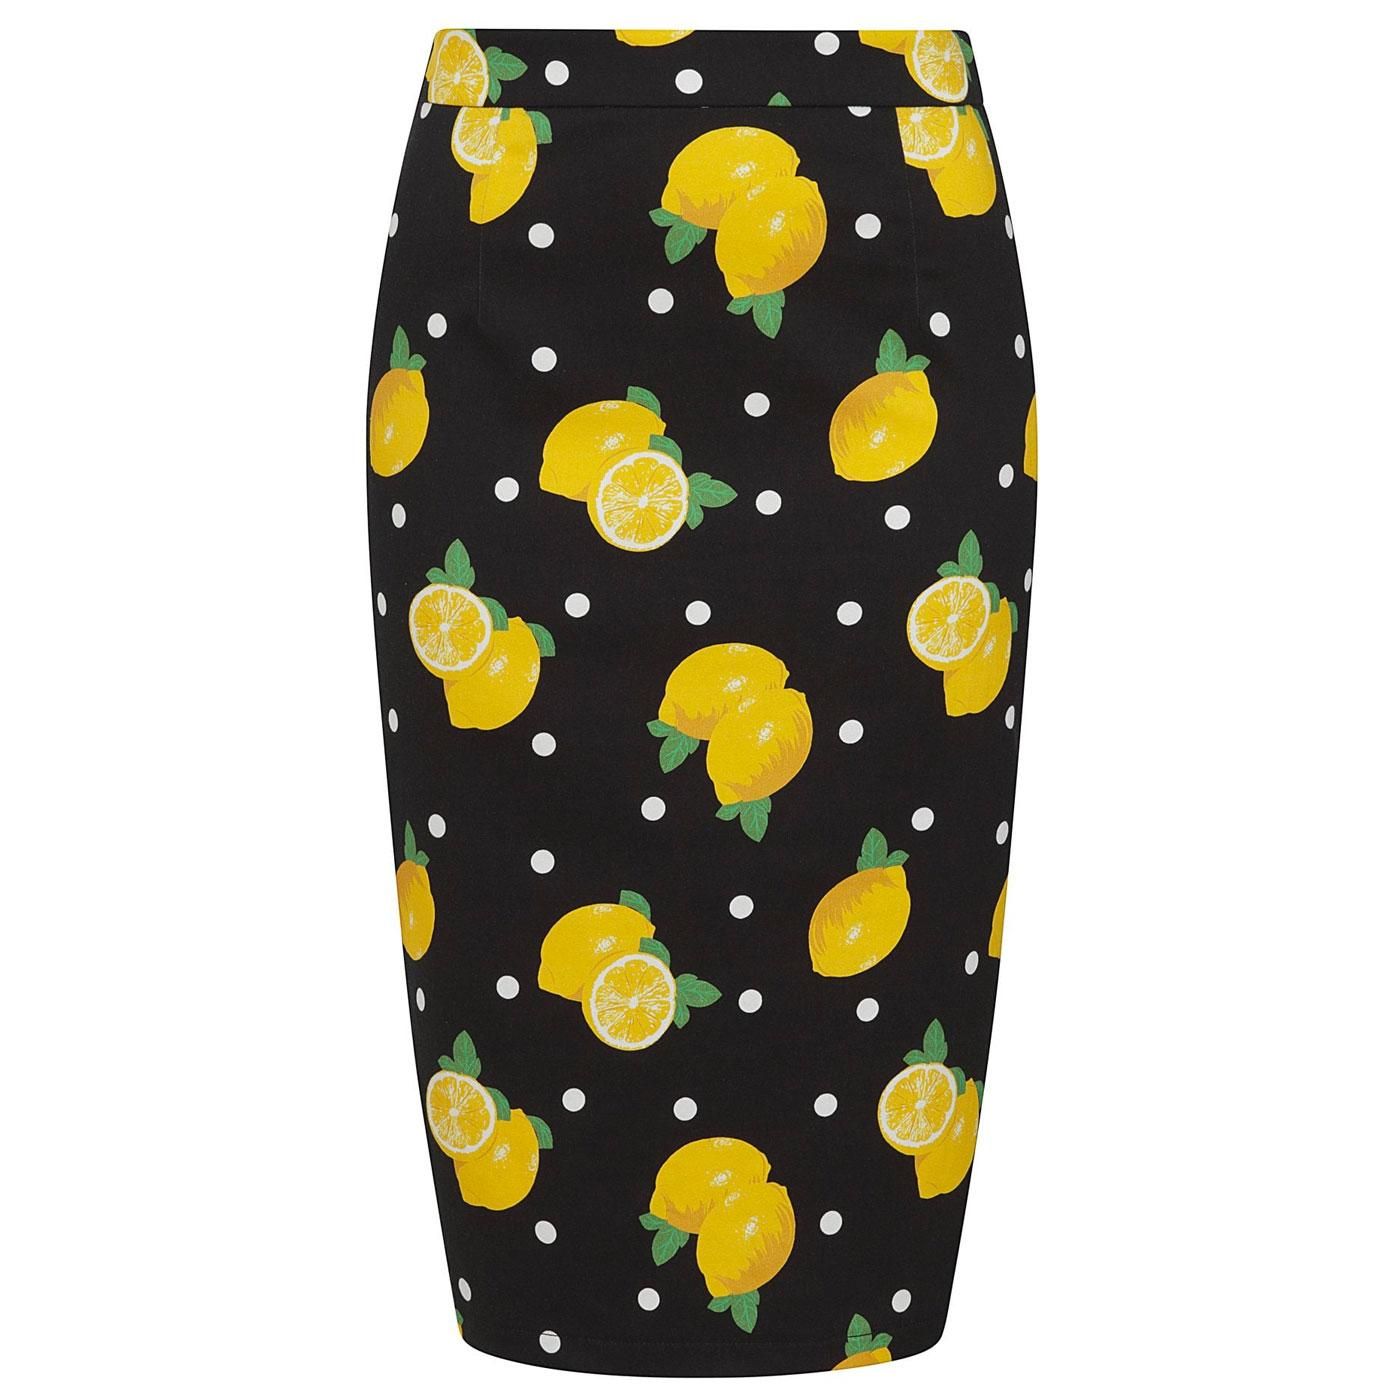 Polly COLLECTIF Retro 50s Lemon Print Pencil Skirt